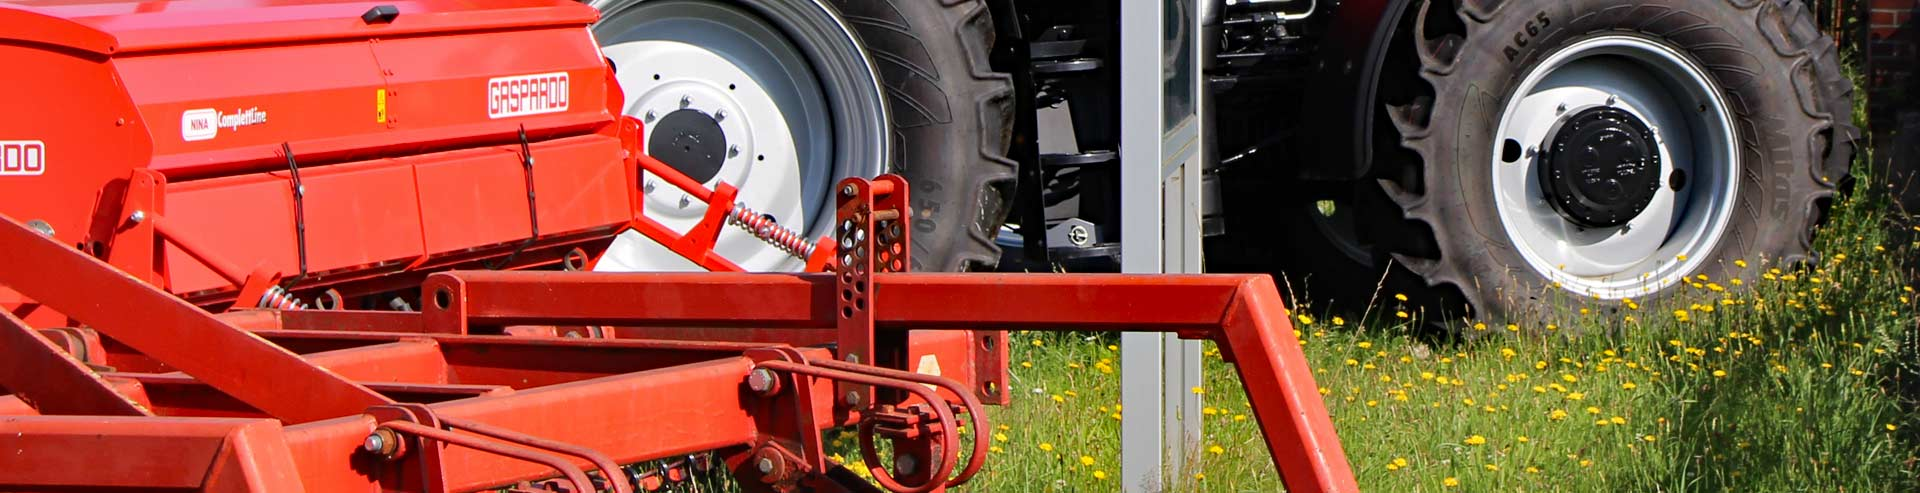 Schmidt Landmaschinen Steimke - Gebrauchtmaschinen - Headerbild